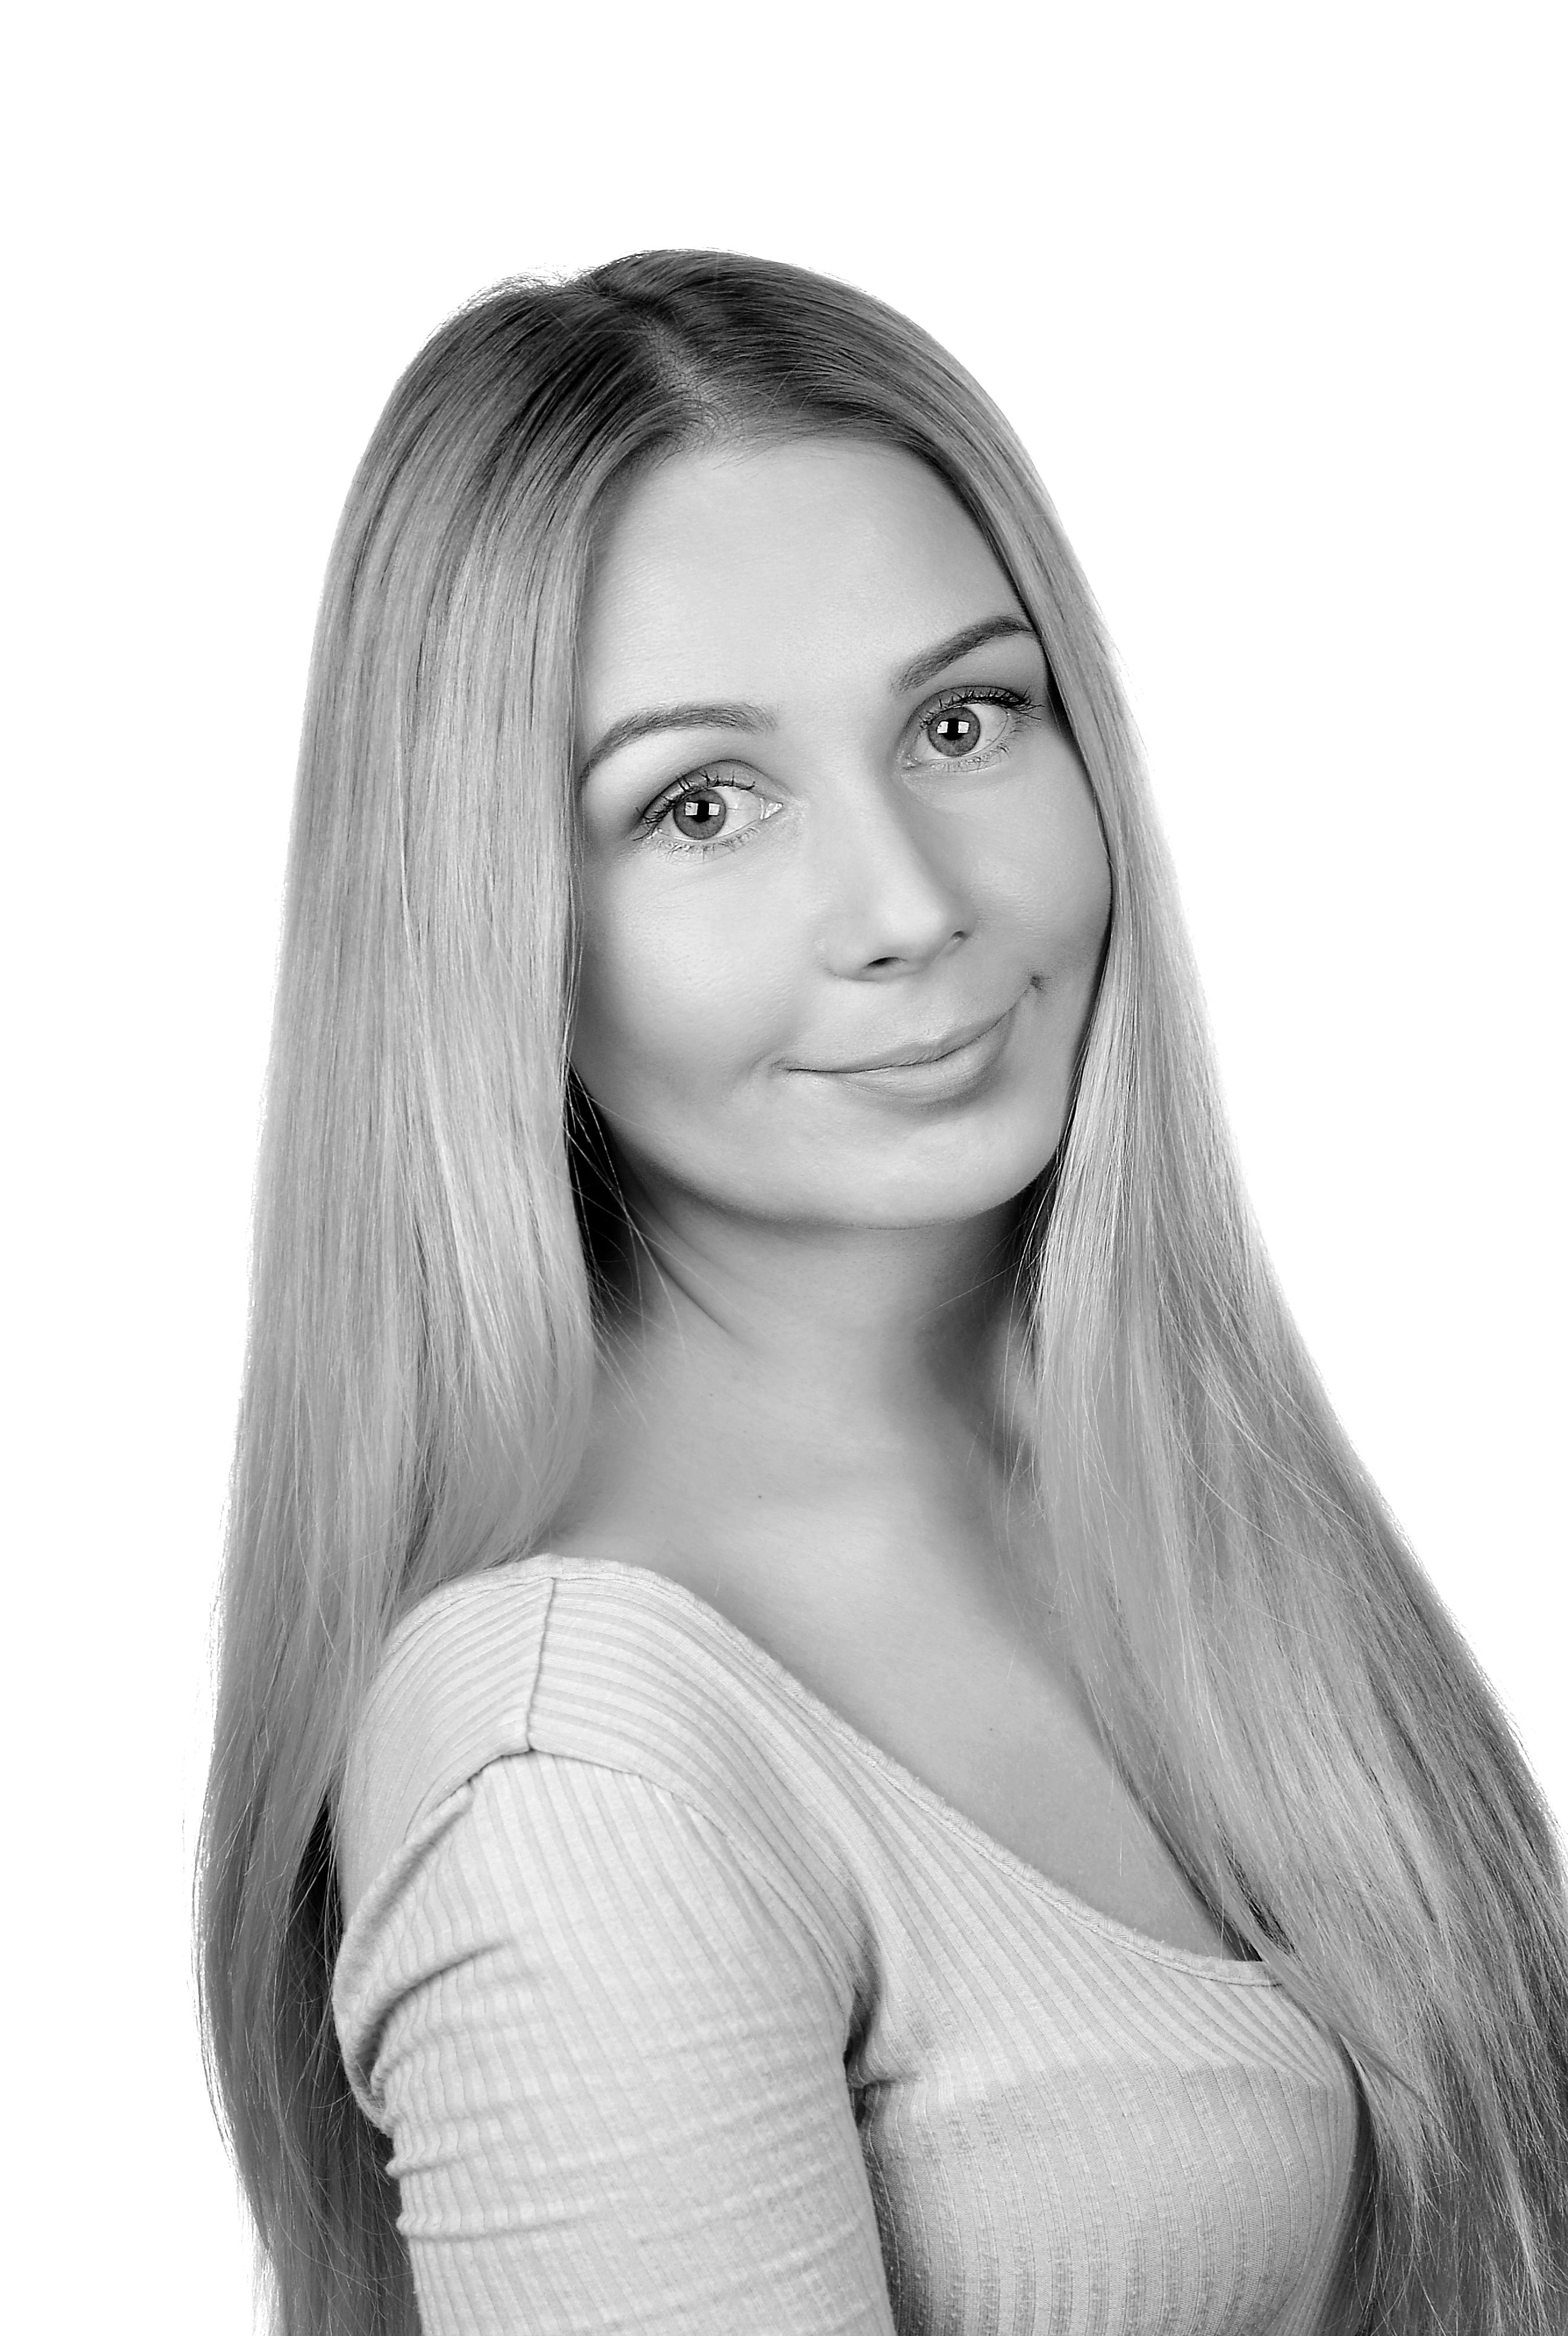 Petronela Palcova